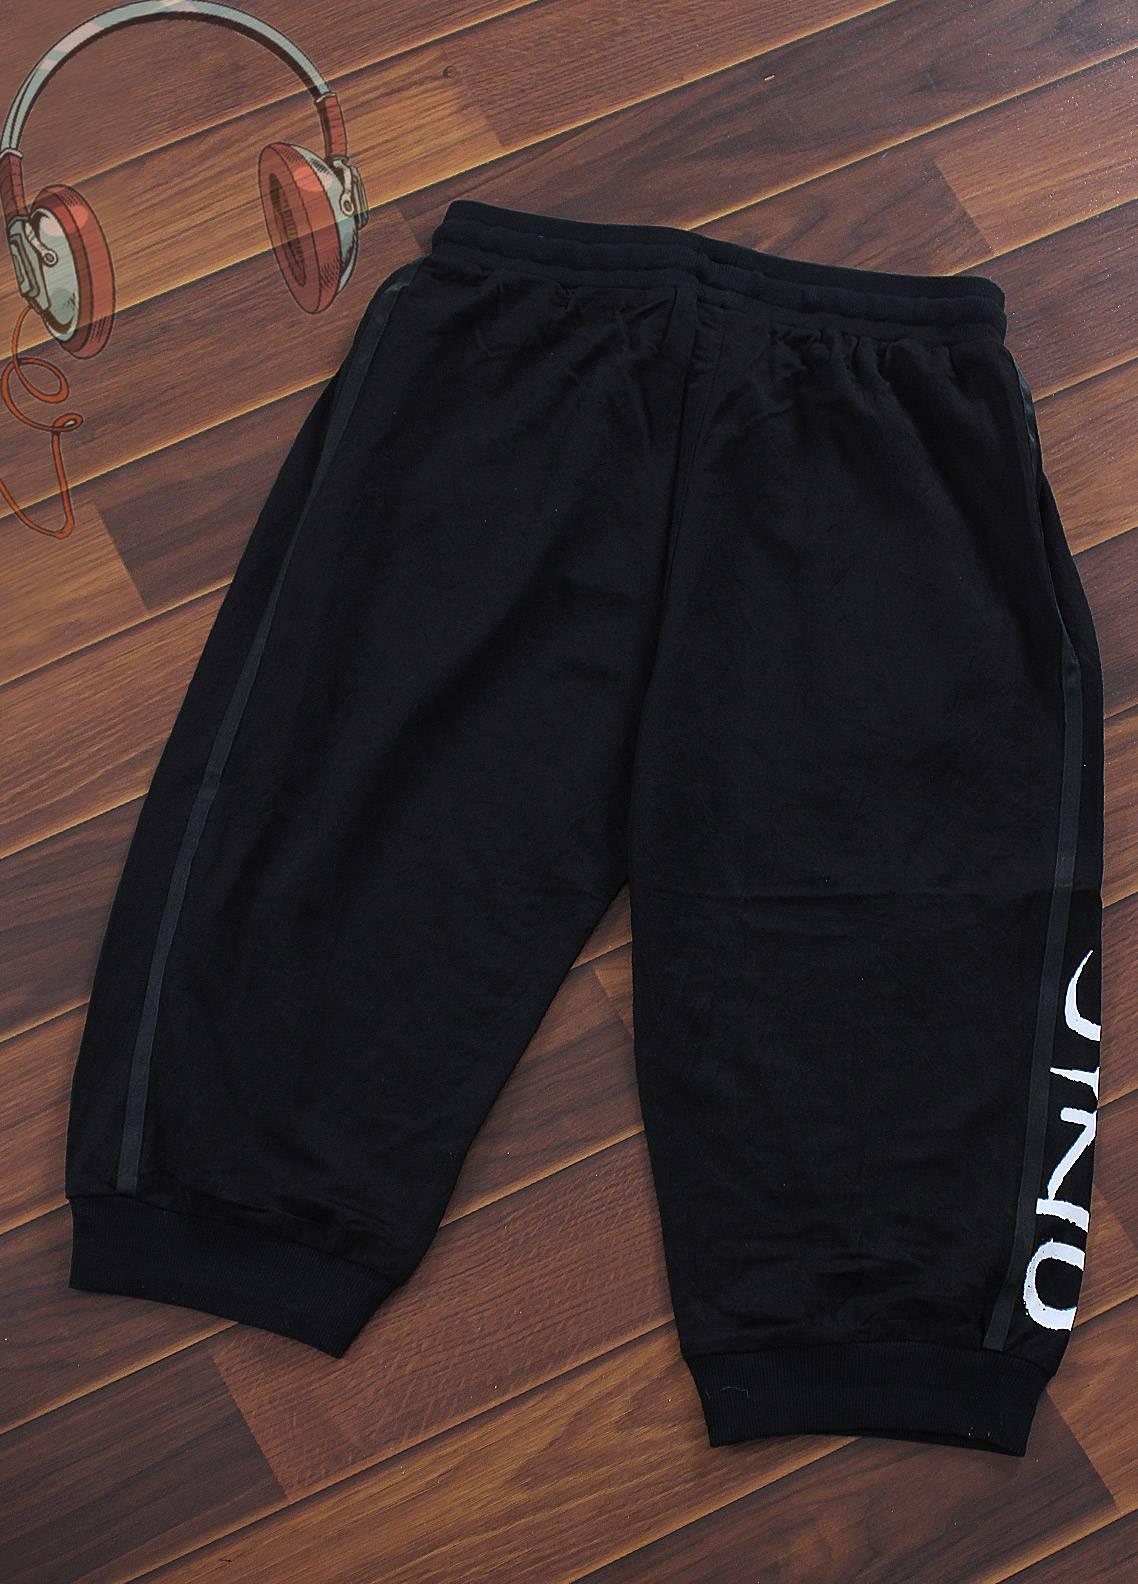 Sanaulla Exclusive Range Jersey Casual Boys Shorts -  F036-Black